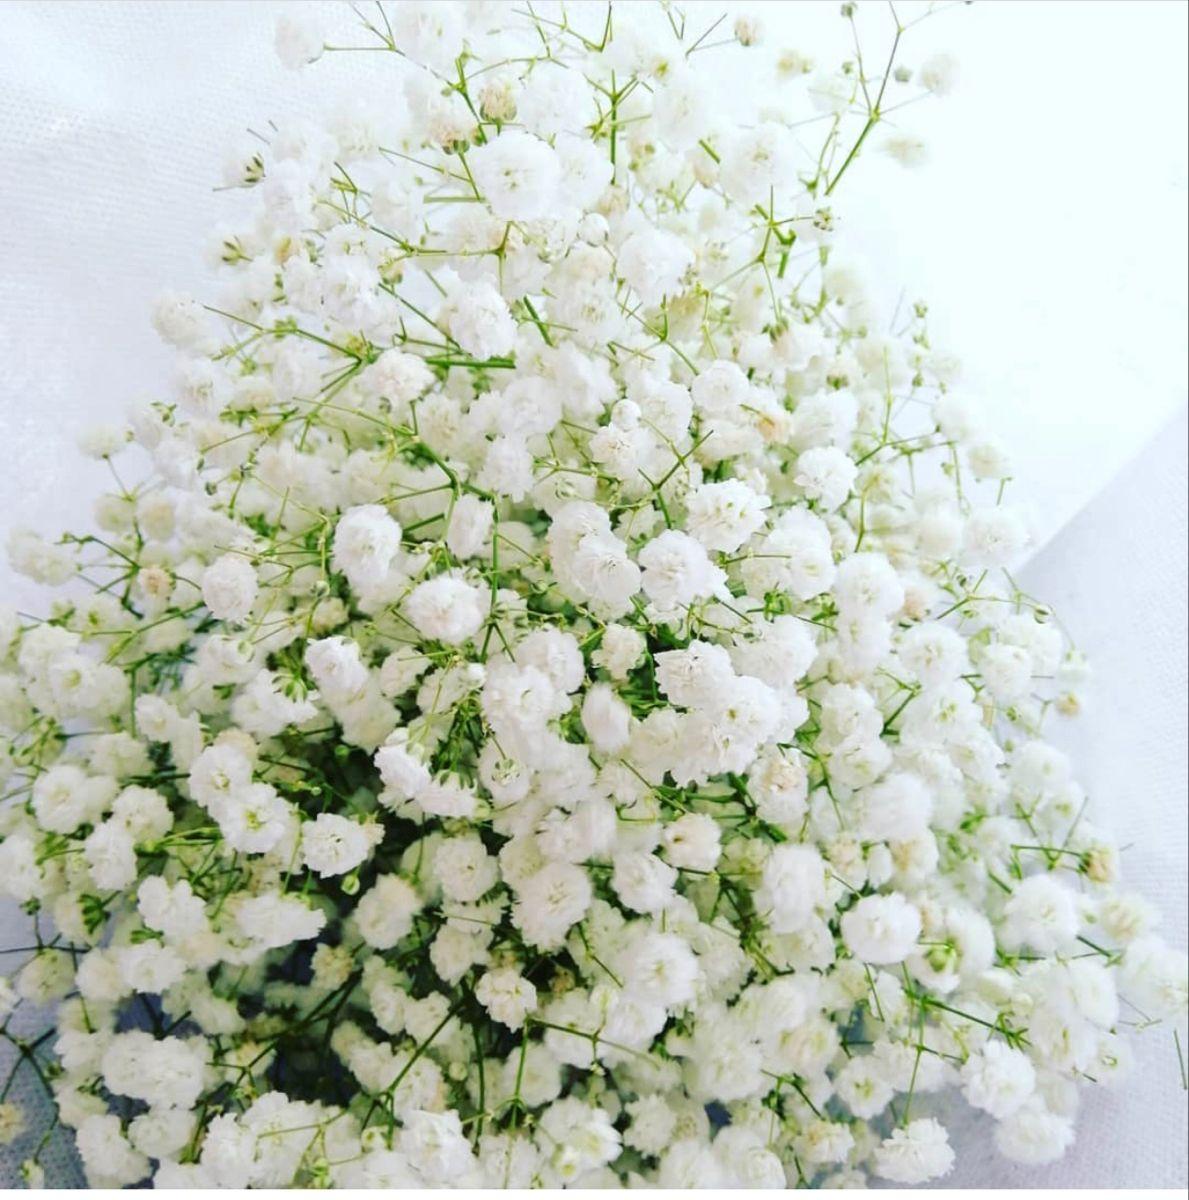 Baby Breath Flowers In 2020 Online Wedding Flowers Flowers For Sale Baby S Breath Wedding Flowers